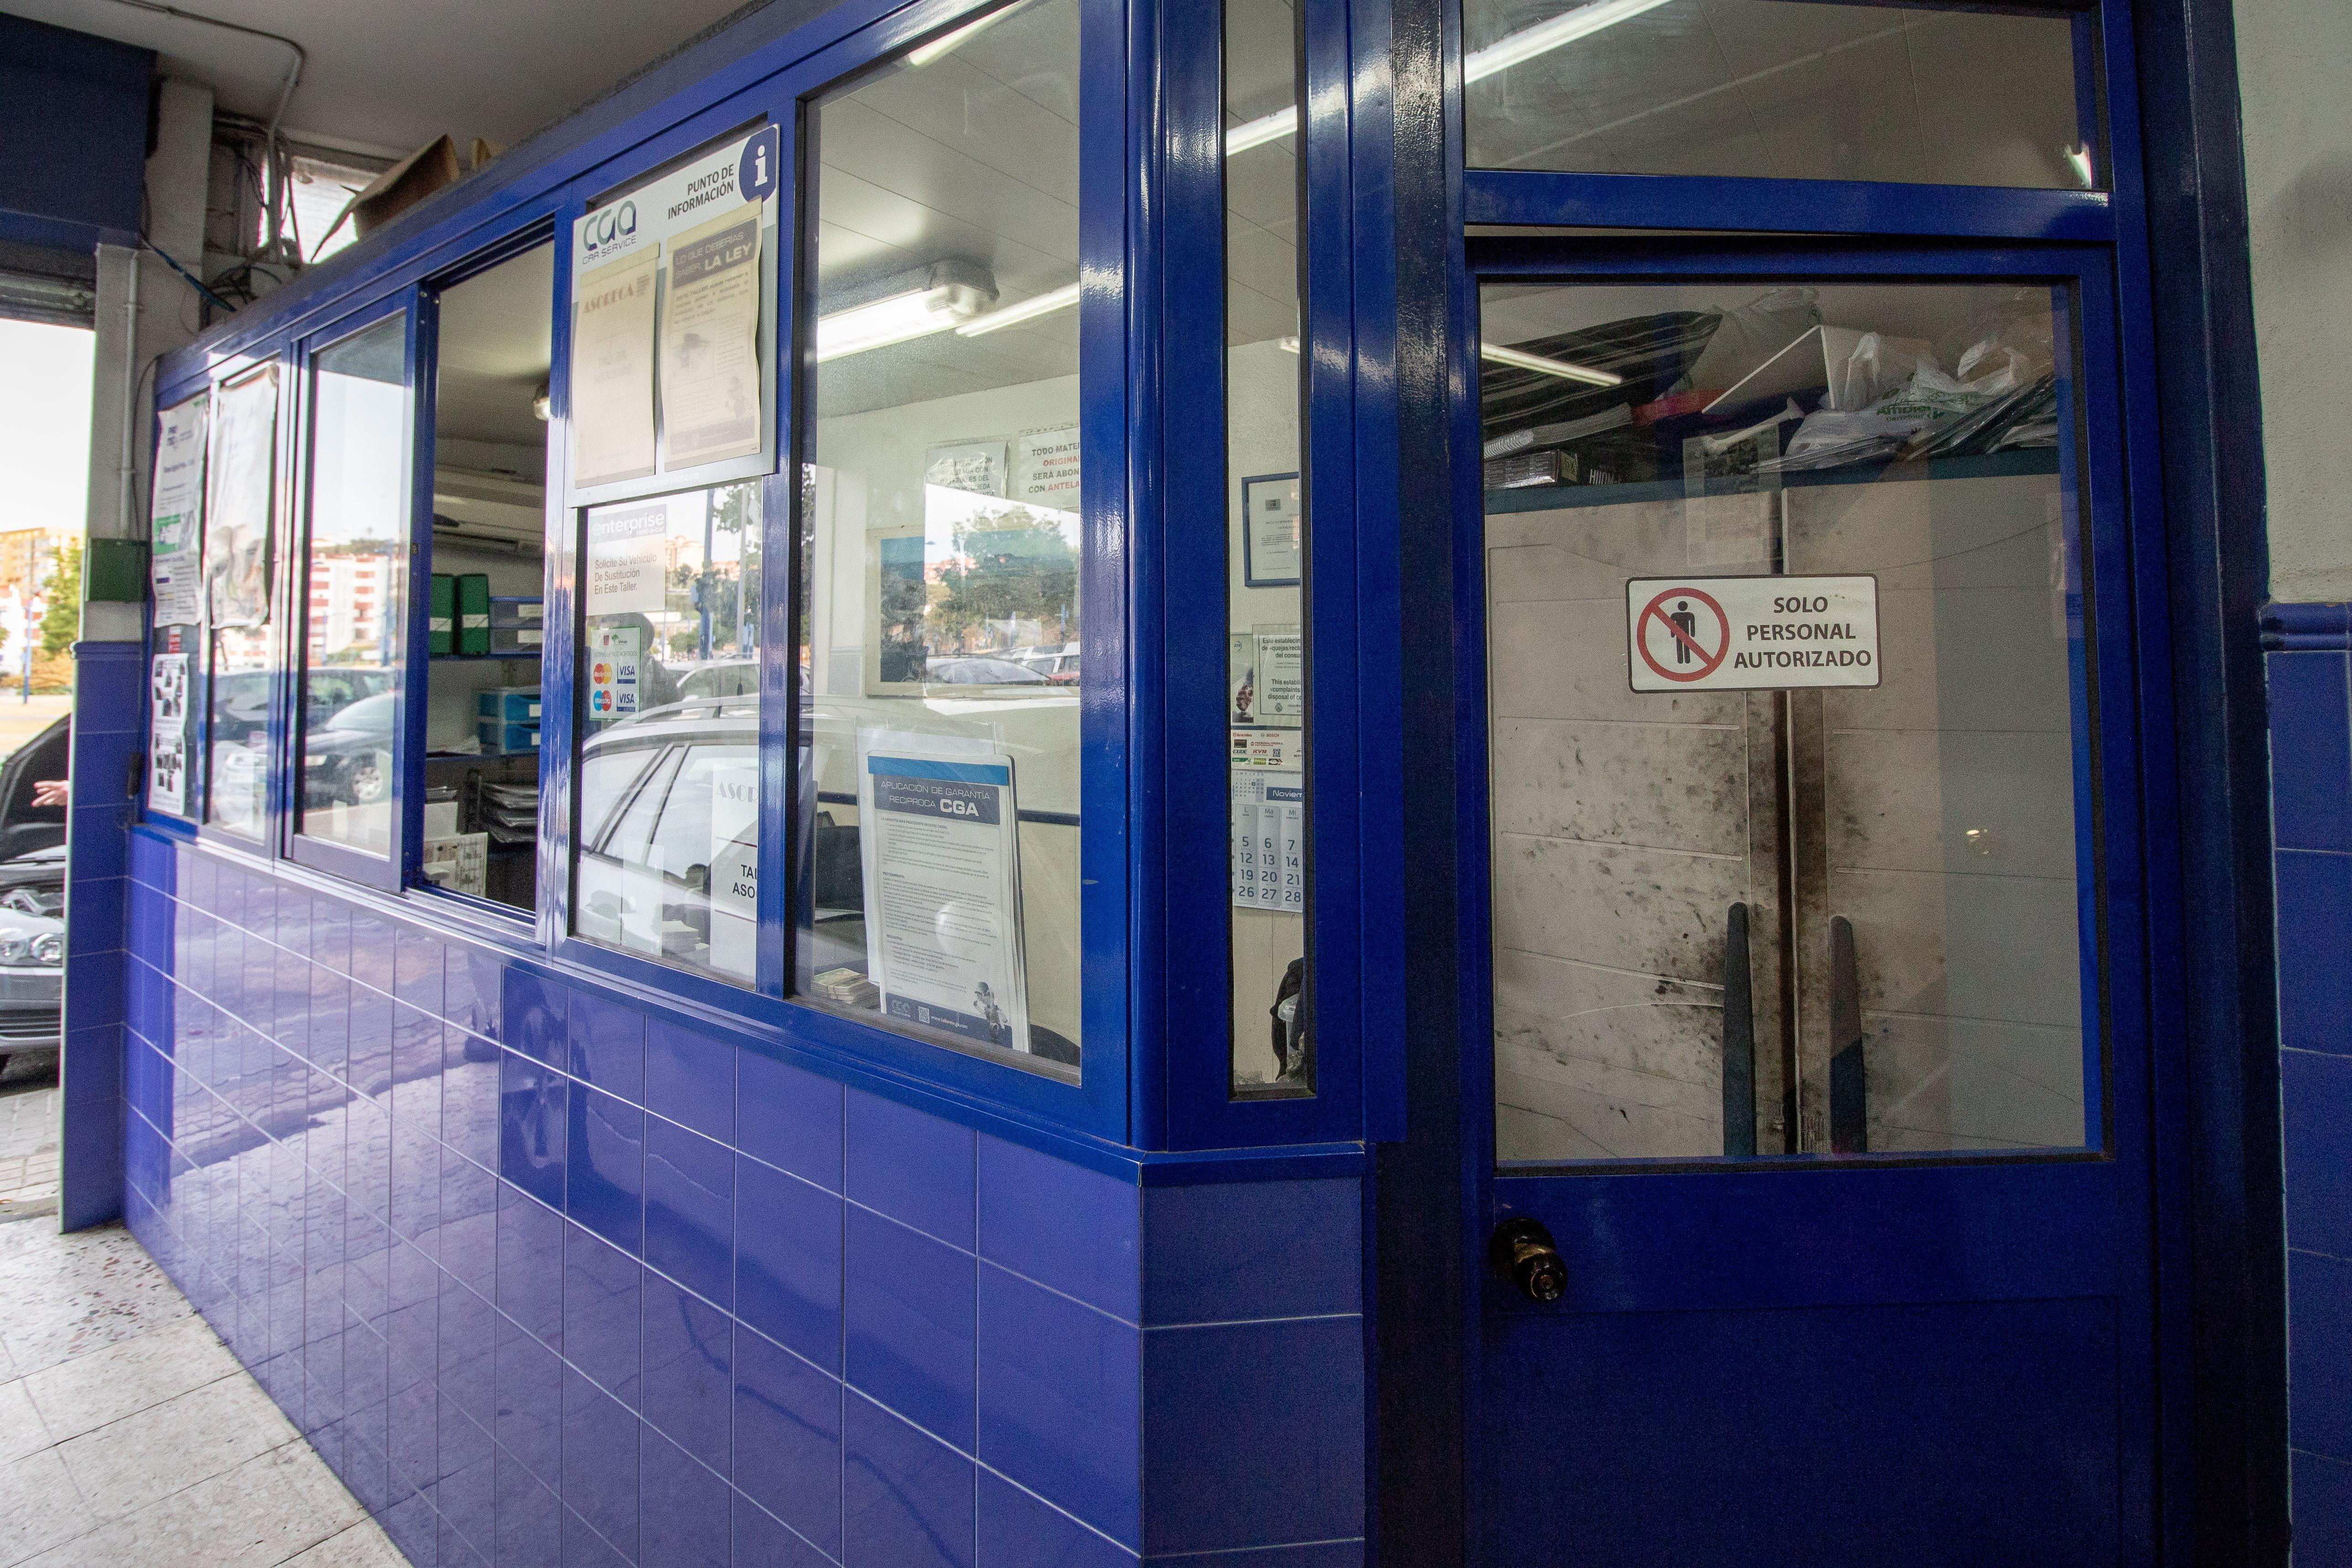 Puerta de entrada a la oficina